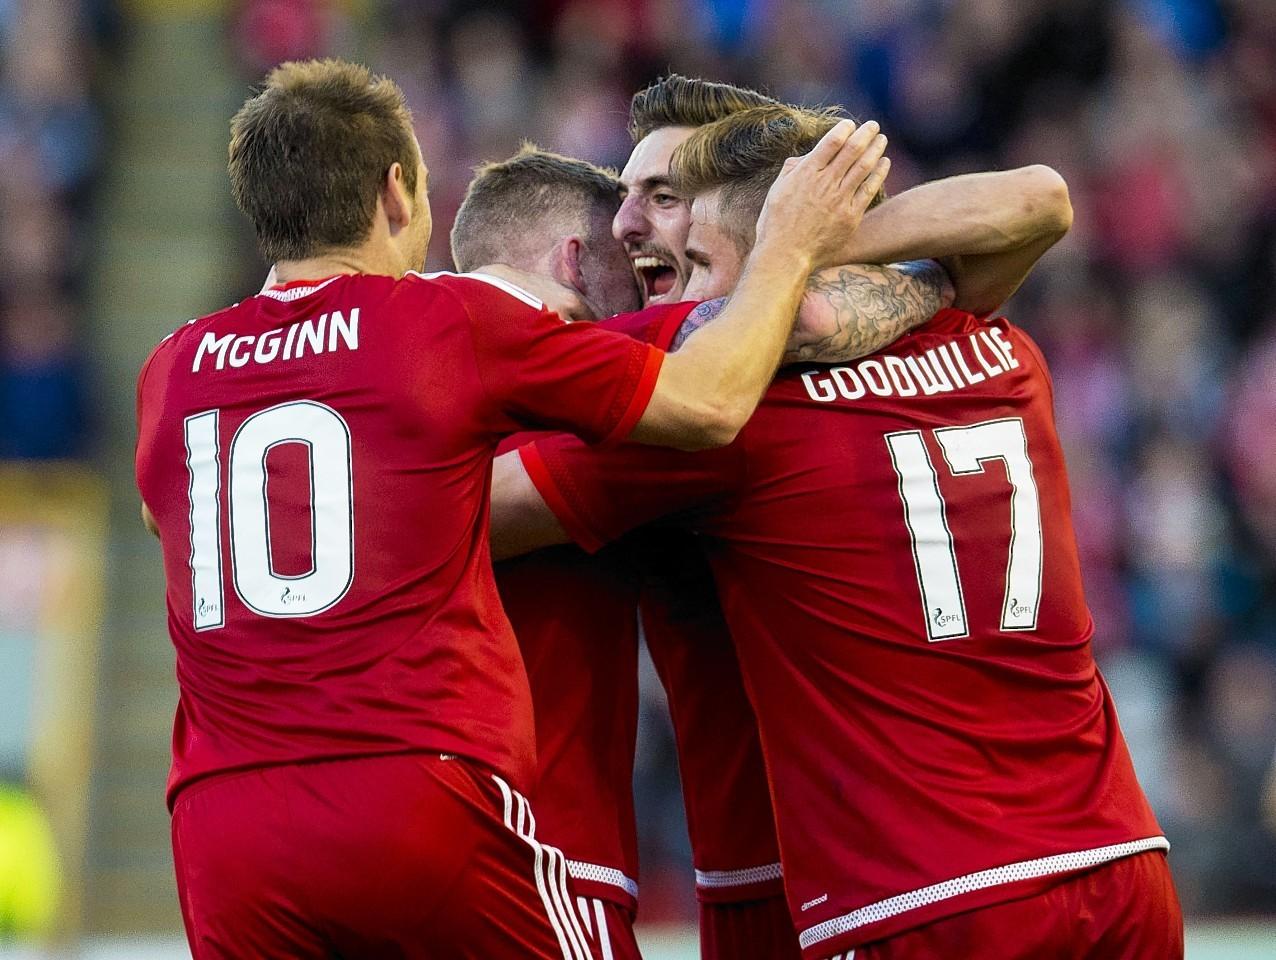 The Dons celebrate Jonny Hayes' goal against Rijeka